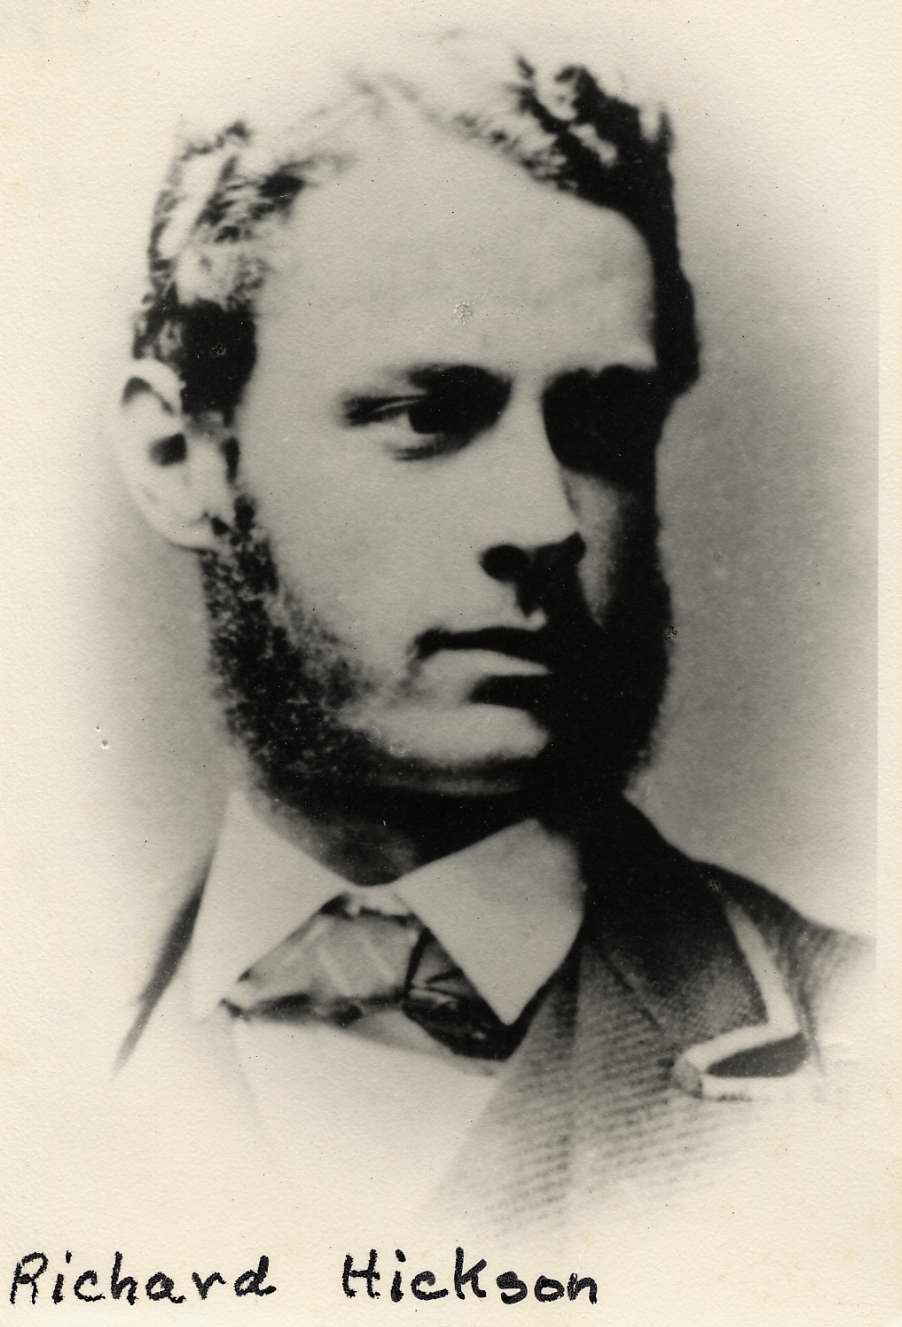 Richard Hickson